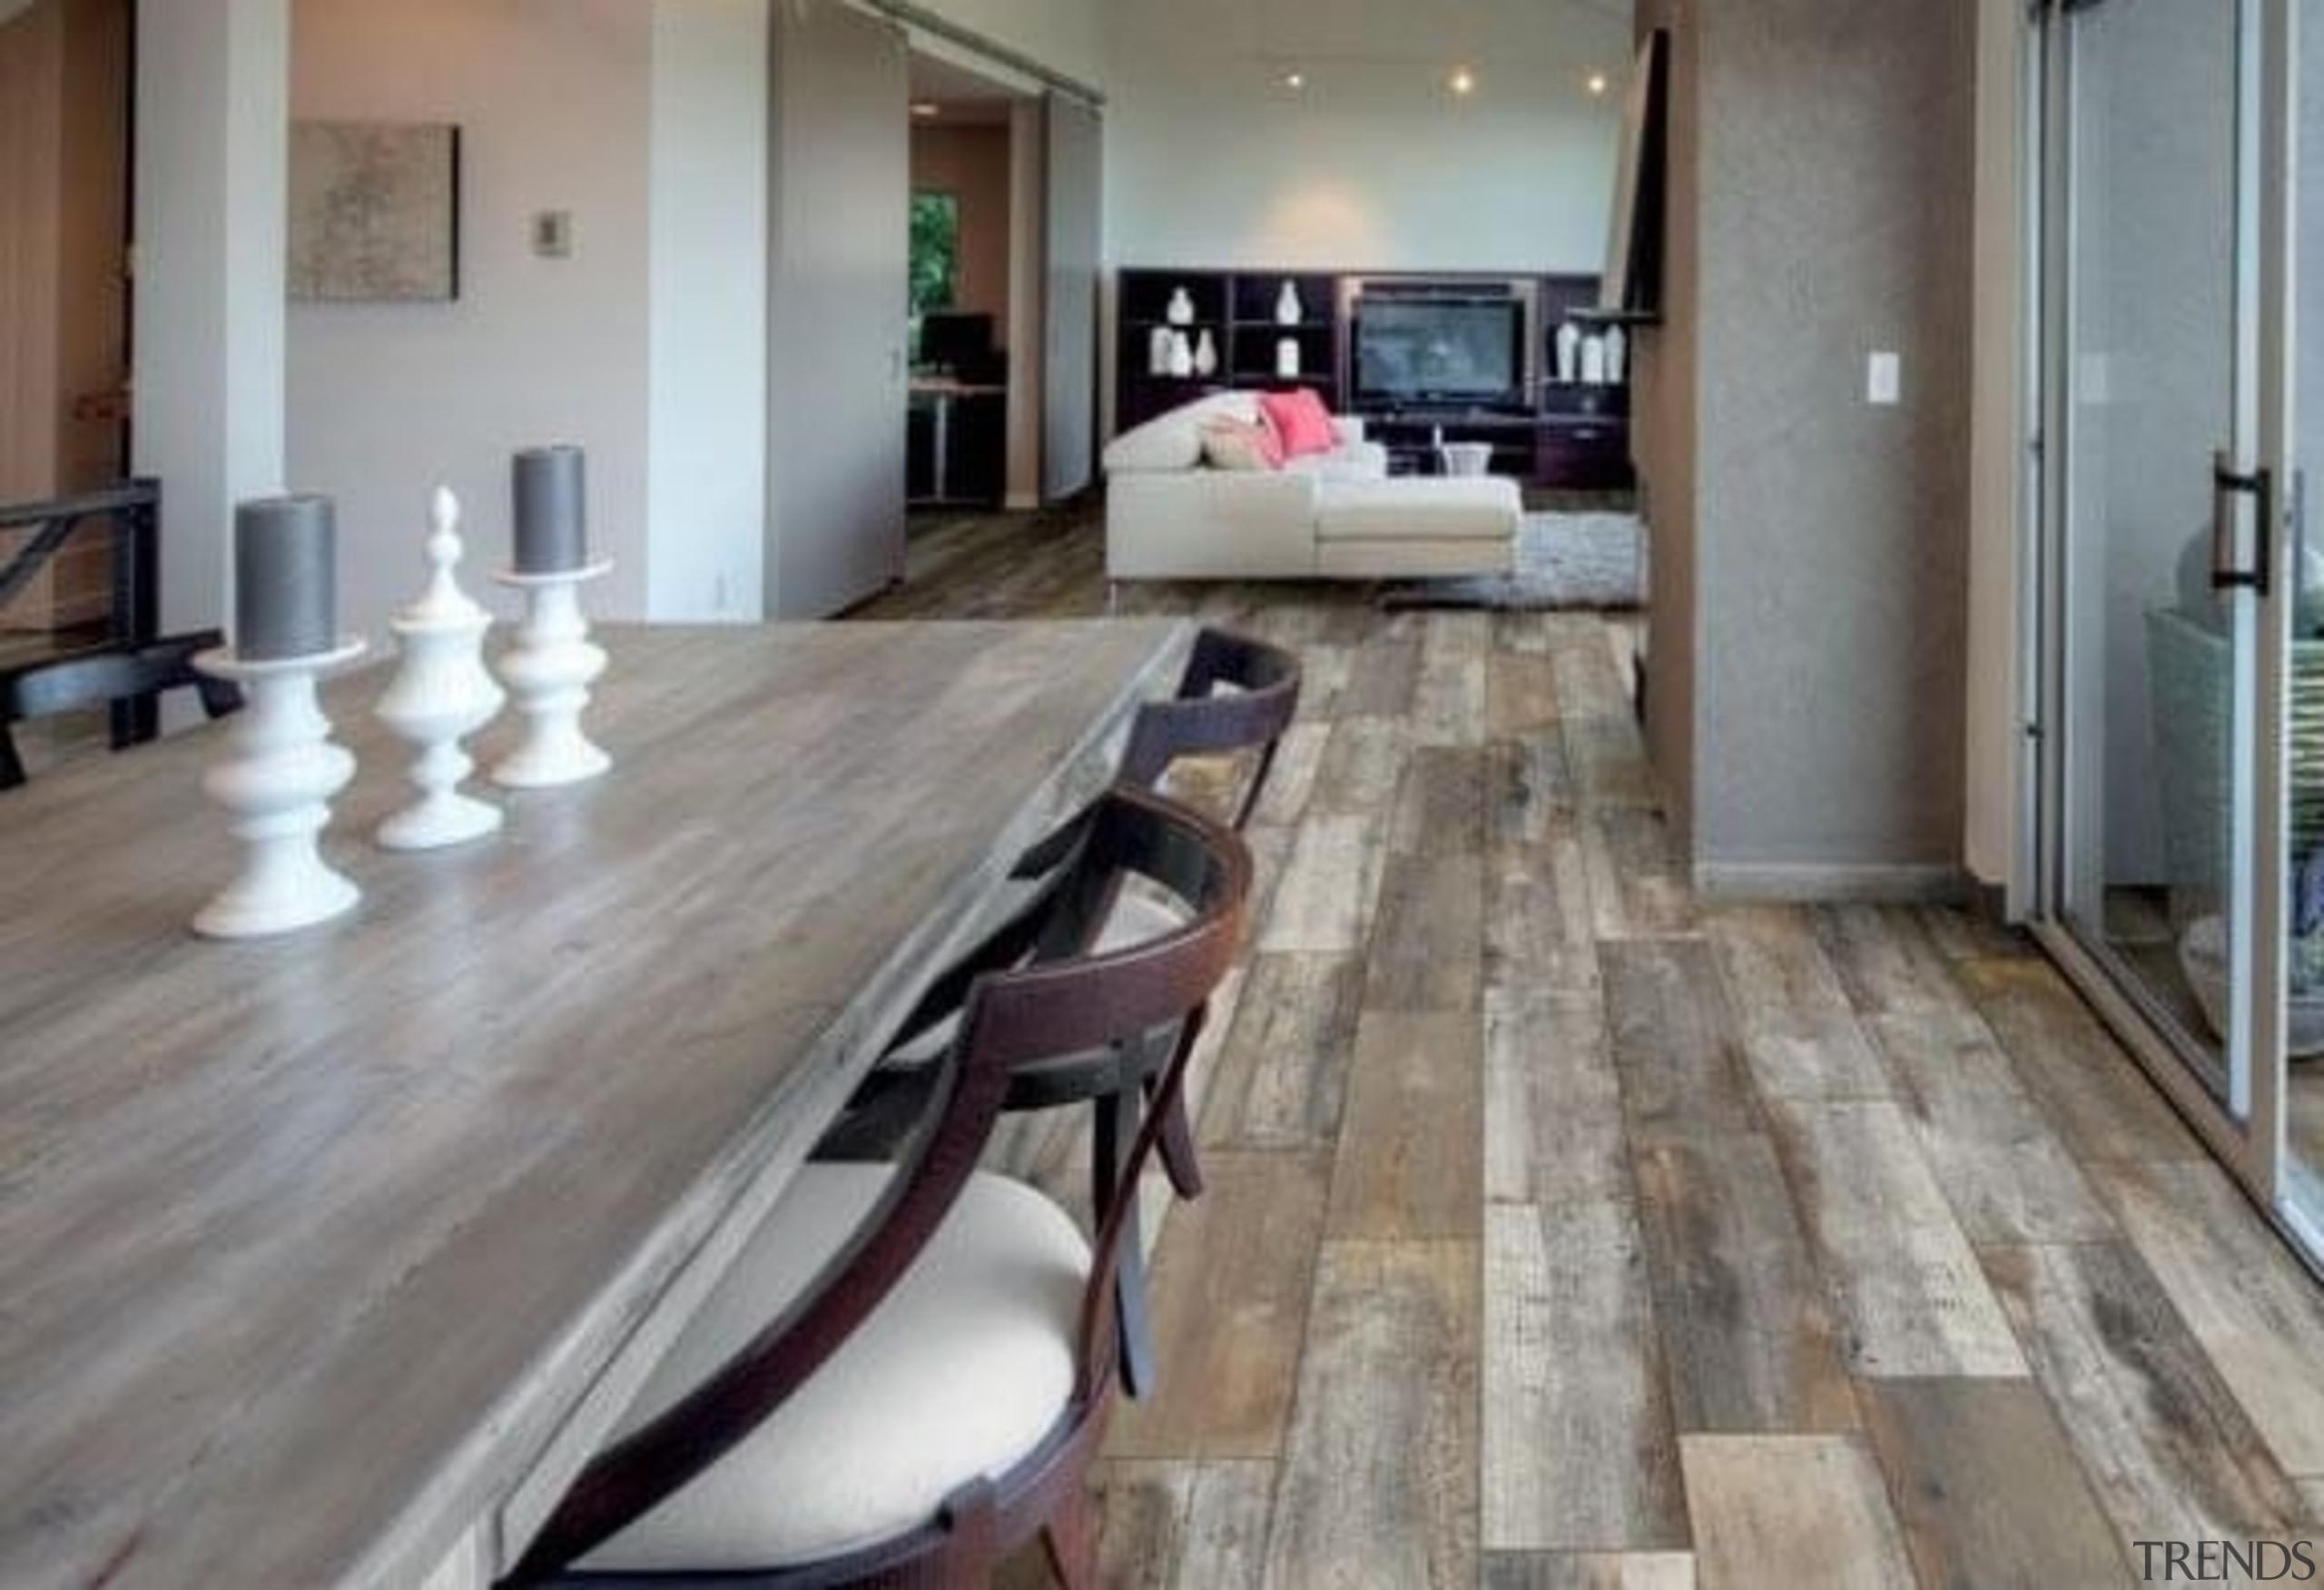 Super flexible, self-levelling floor tiles, available in 270x1630mm floor, flooring, hardwood, interior design, laminate flooring, property, tile, wood, wood flooring, gray